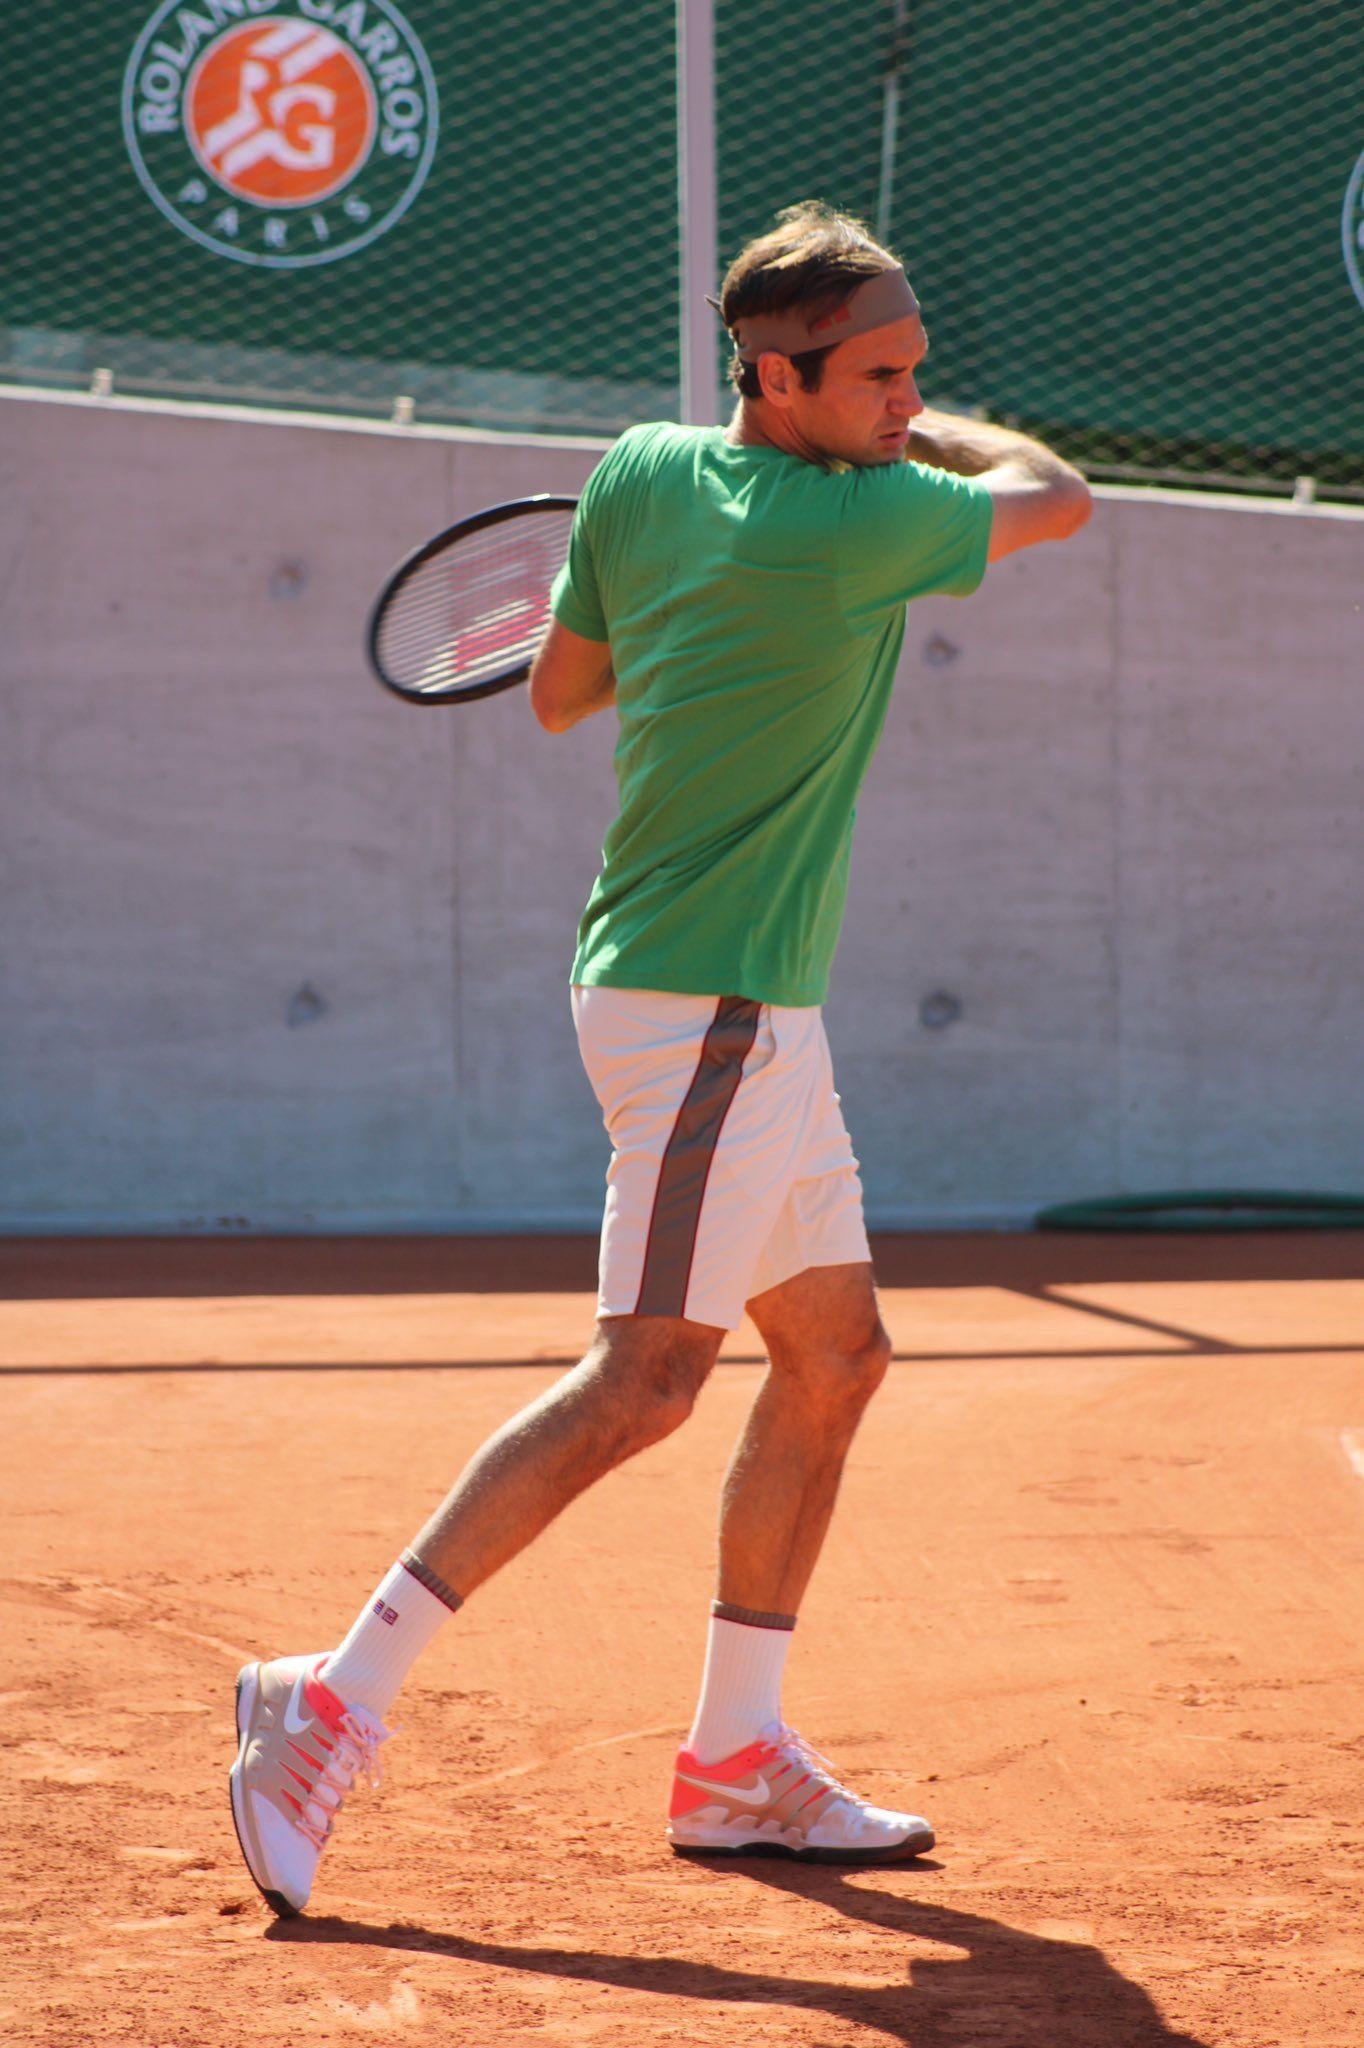 Roger Federer Morning Practise May 31 Roland Garros Rg19 In 2020 Tennis Photos Roger Federer Athletic Men